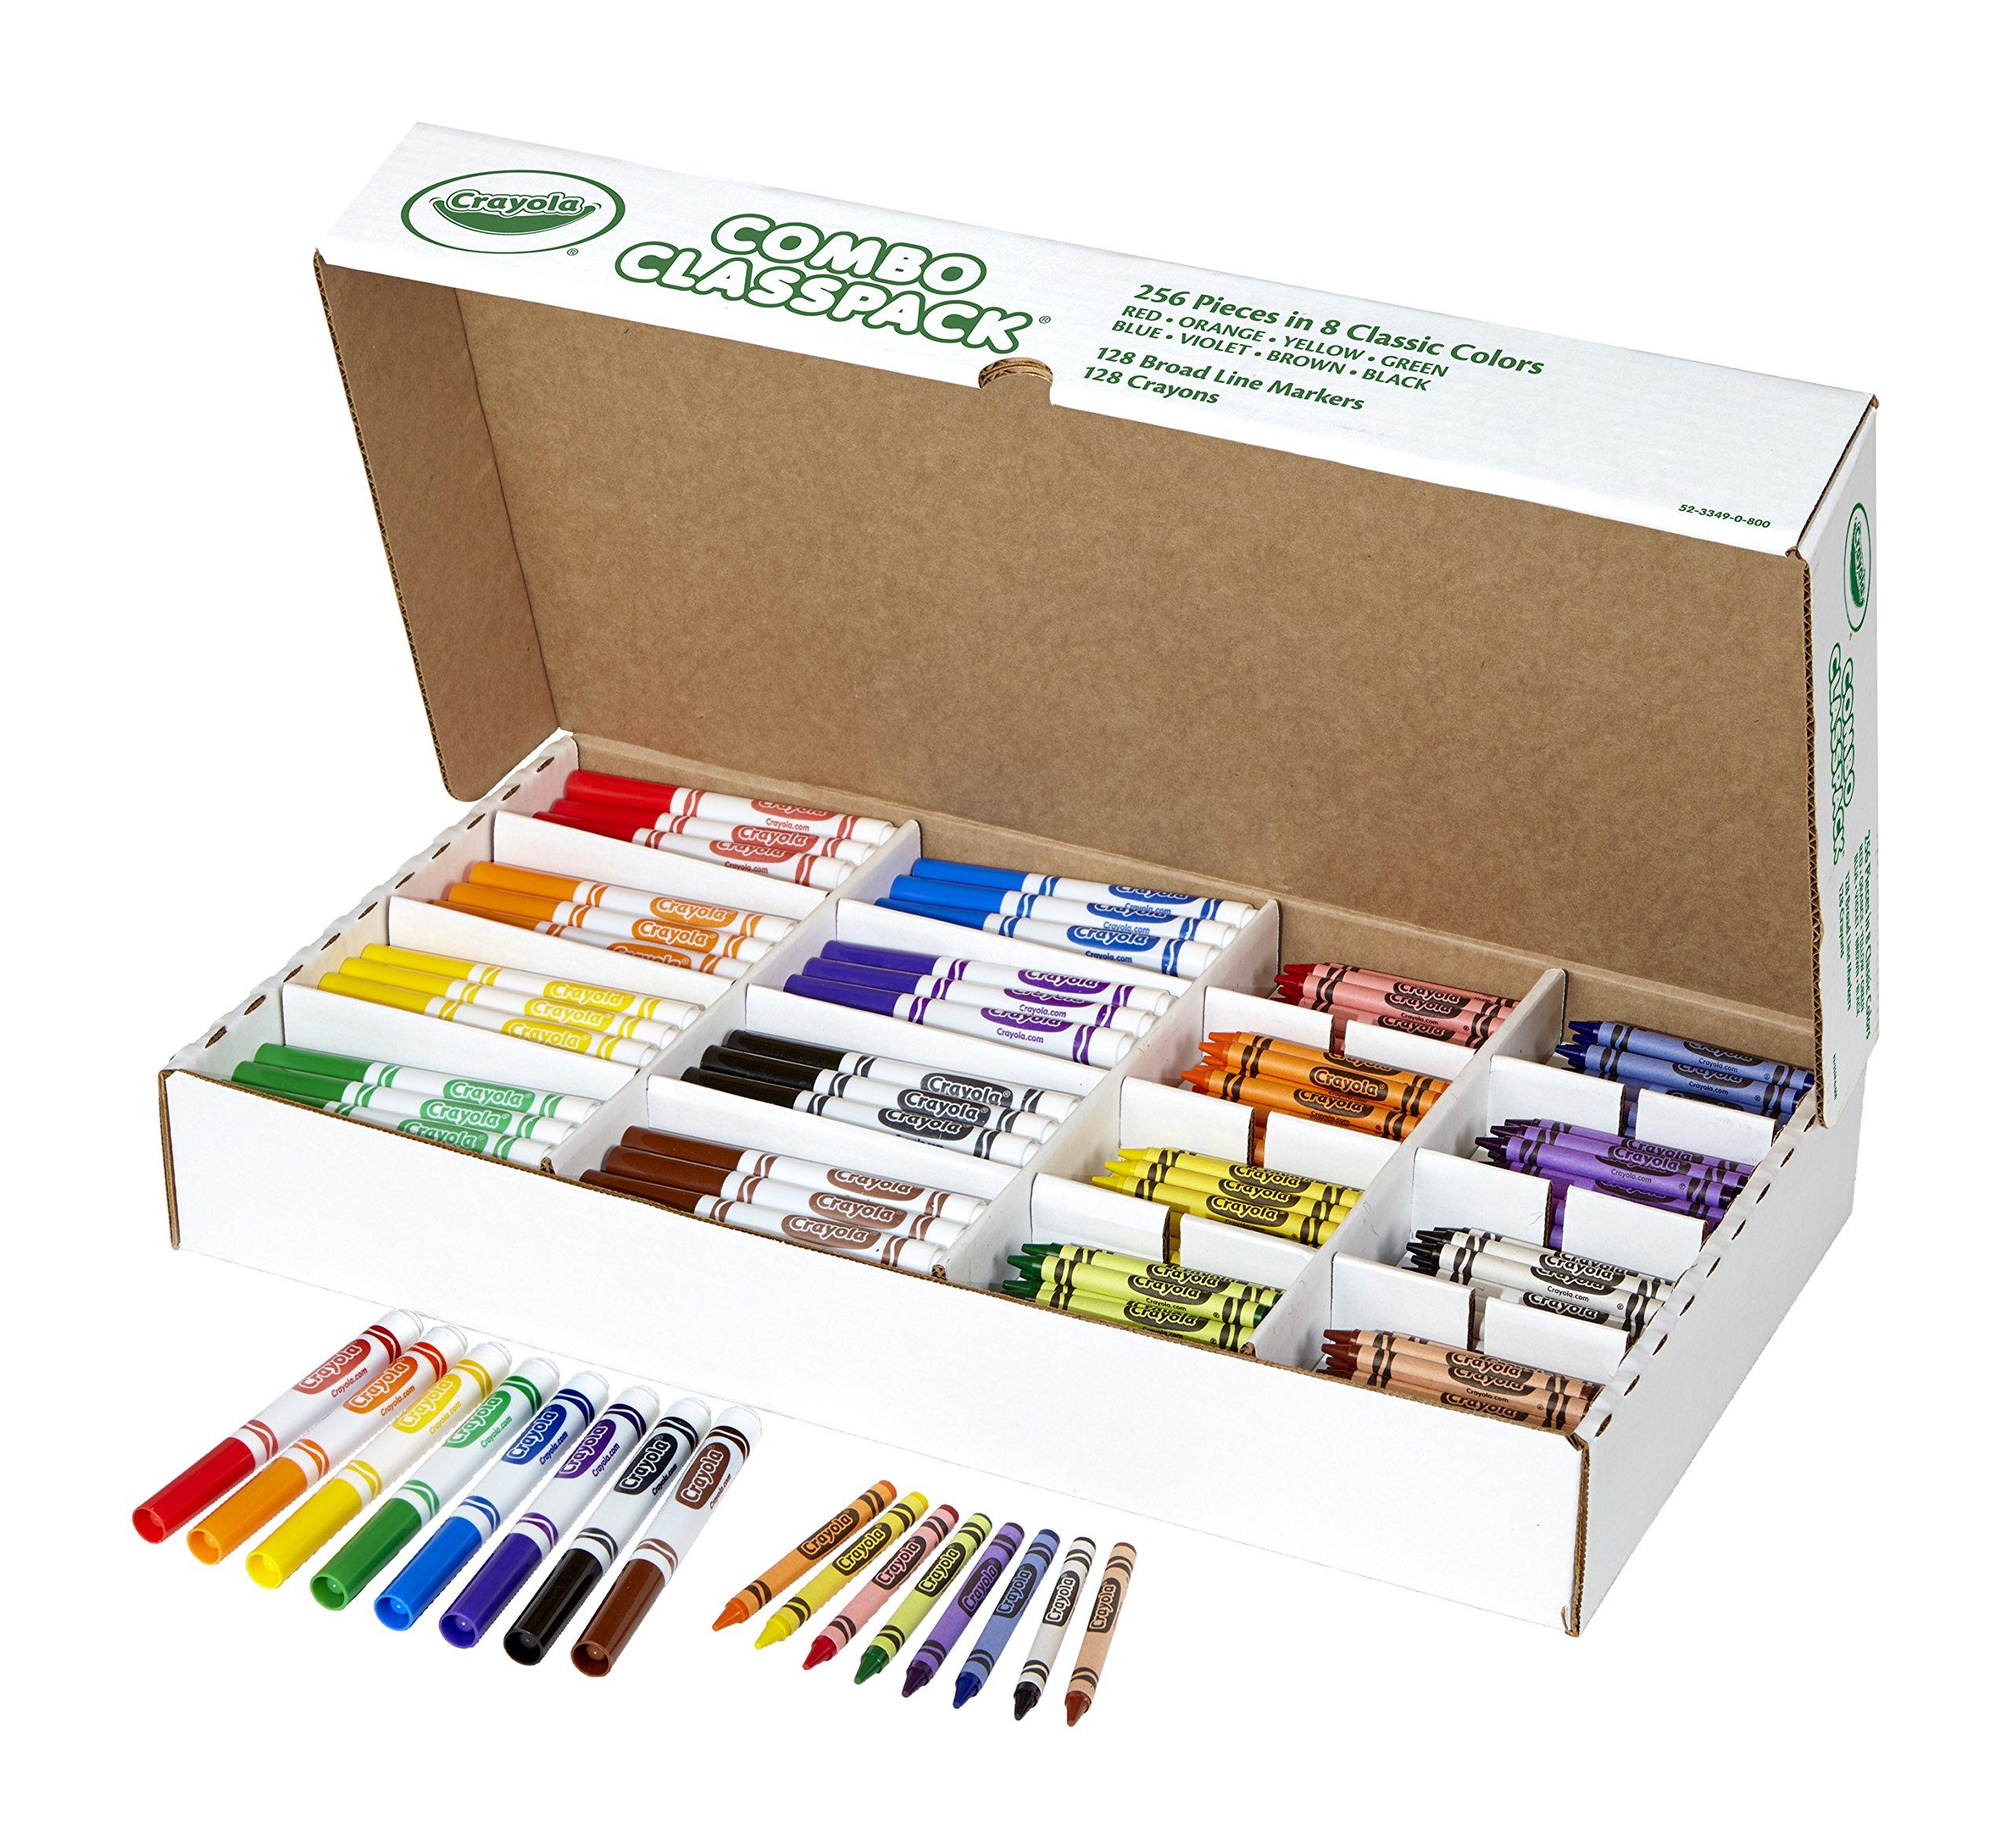 Crayola Bulk Markers and Crayons, 256 Count Classpack by Crayola